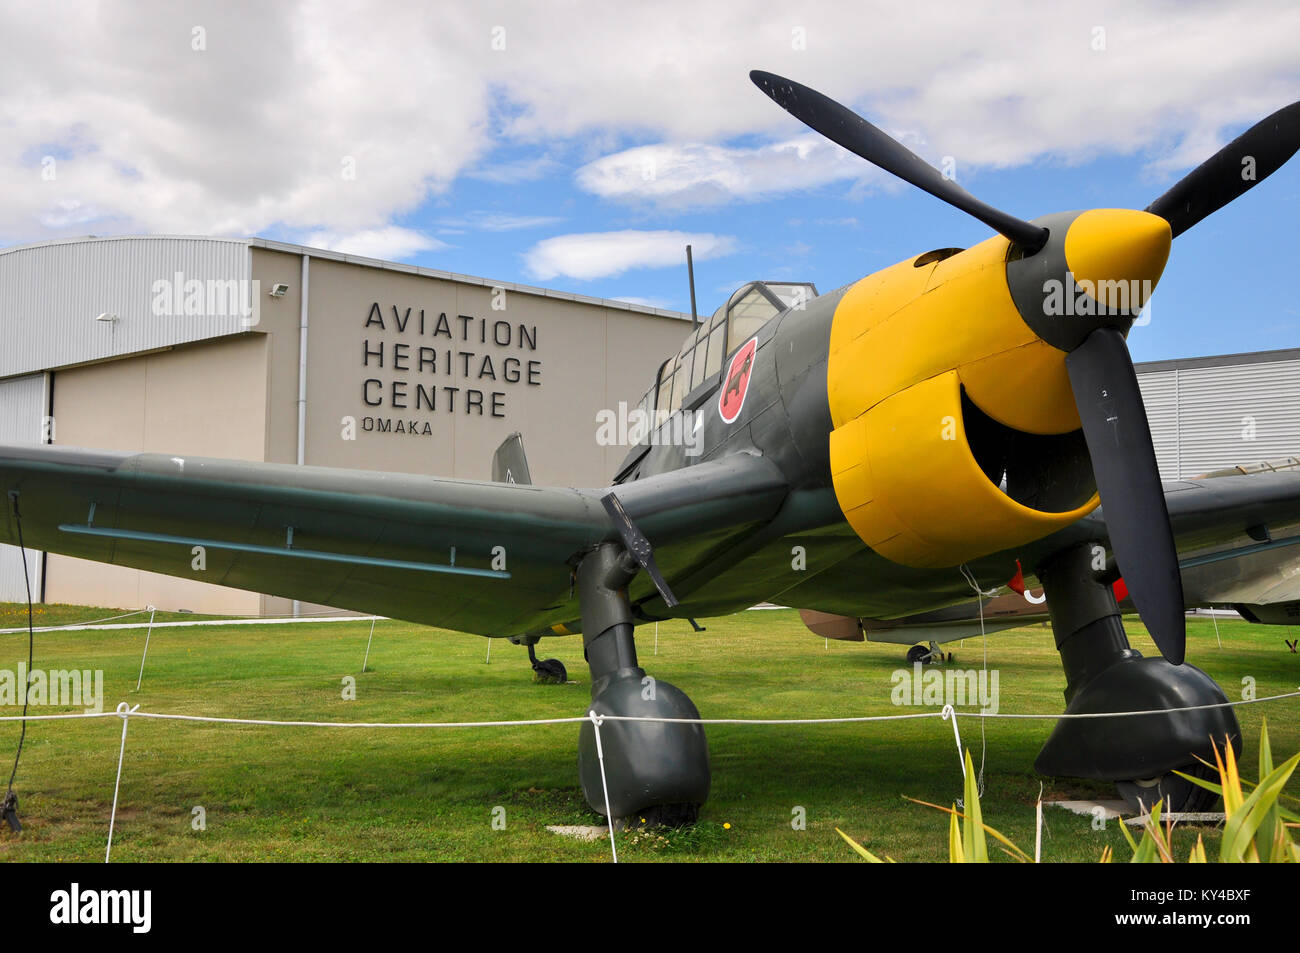 Omaka Aviation Heritage Centre museum, South Island, New Zealand. Junkers Ju-87 Stuka gate guardian - Stock Image